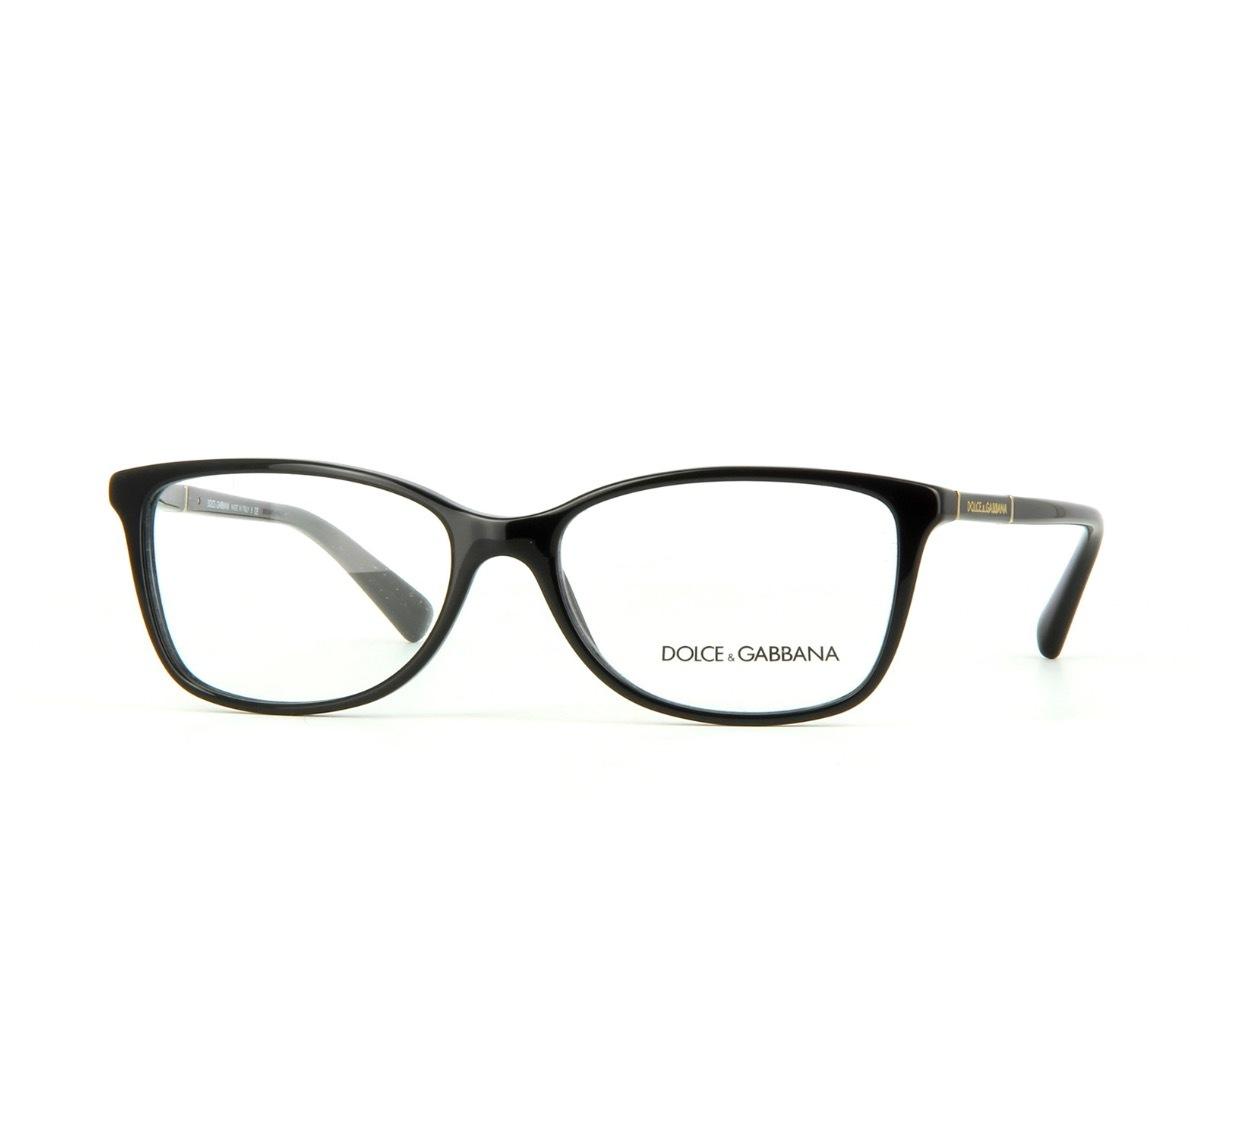 ba9e93193c9 Dolce   Gabbana DG3219 501 Black Eyeglass and 32 similar items